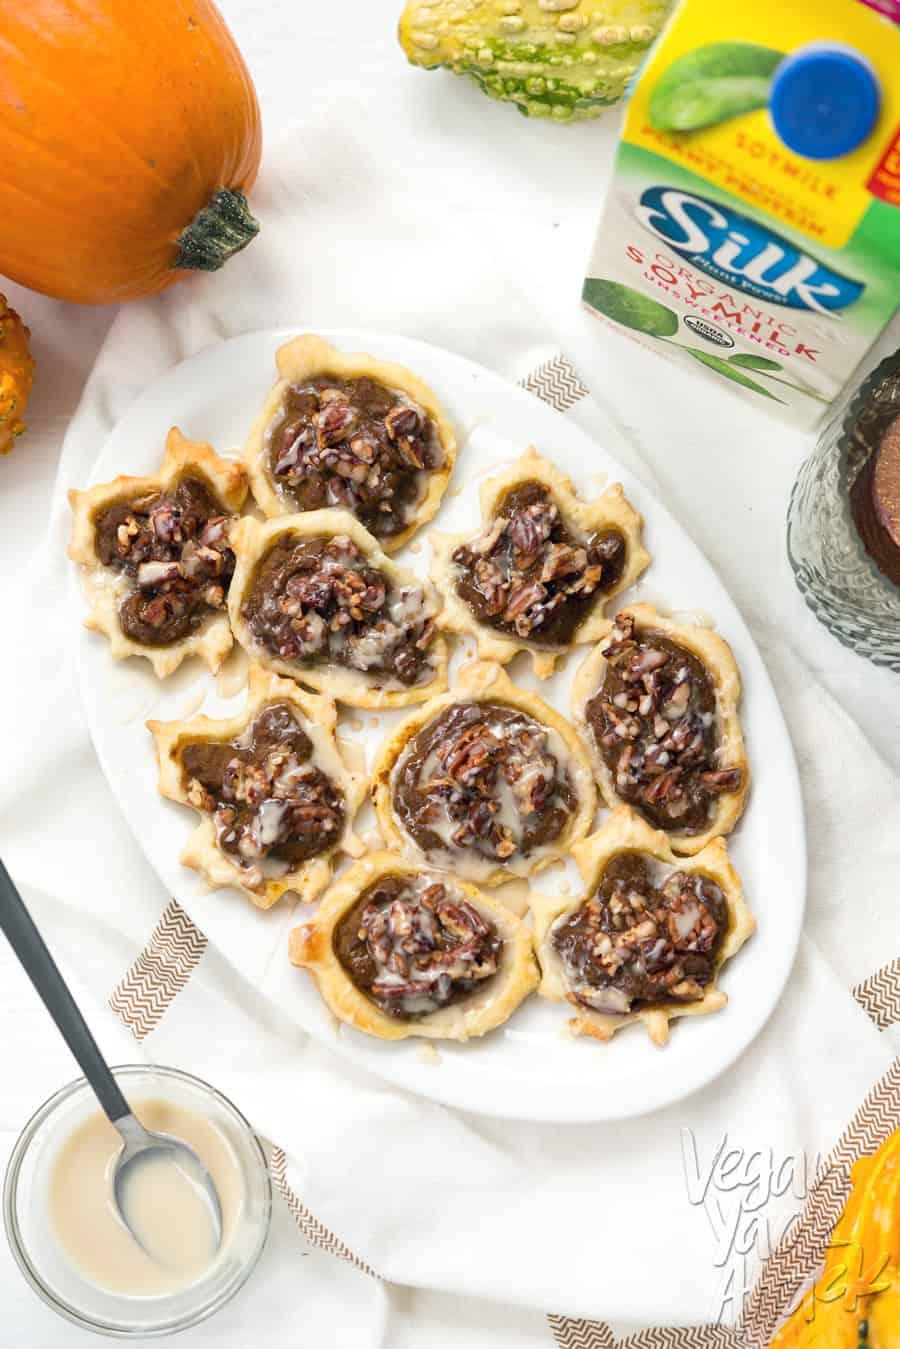 Vegan Pecan Pumpkin Pastries with Easy Maple Glaze - Easier than pie, and great for parties! @VeganYackAttack @Silk #spon #doplants